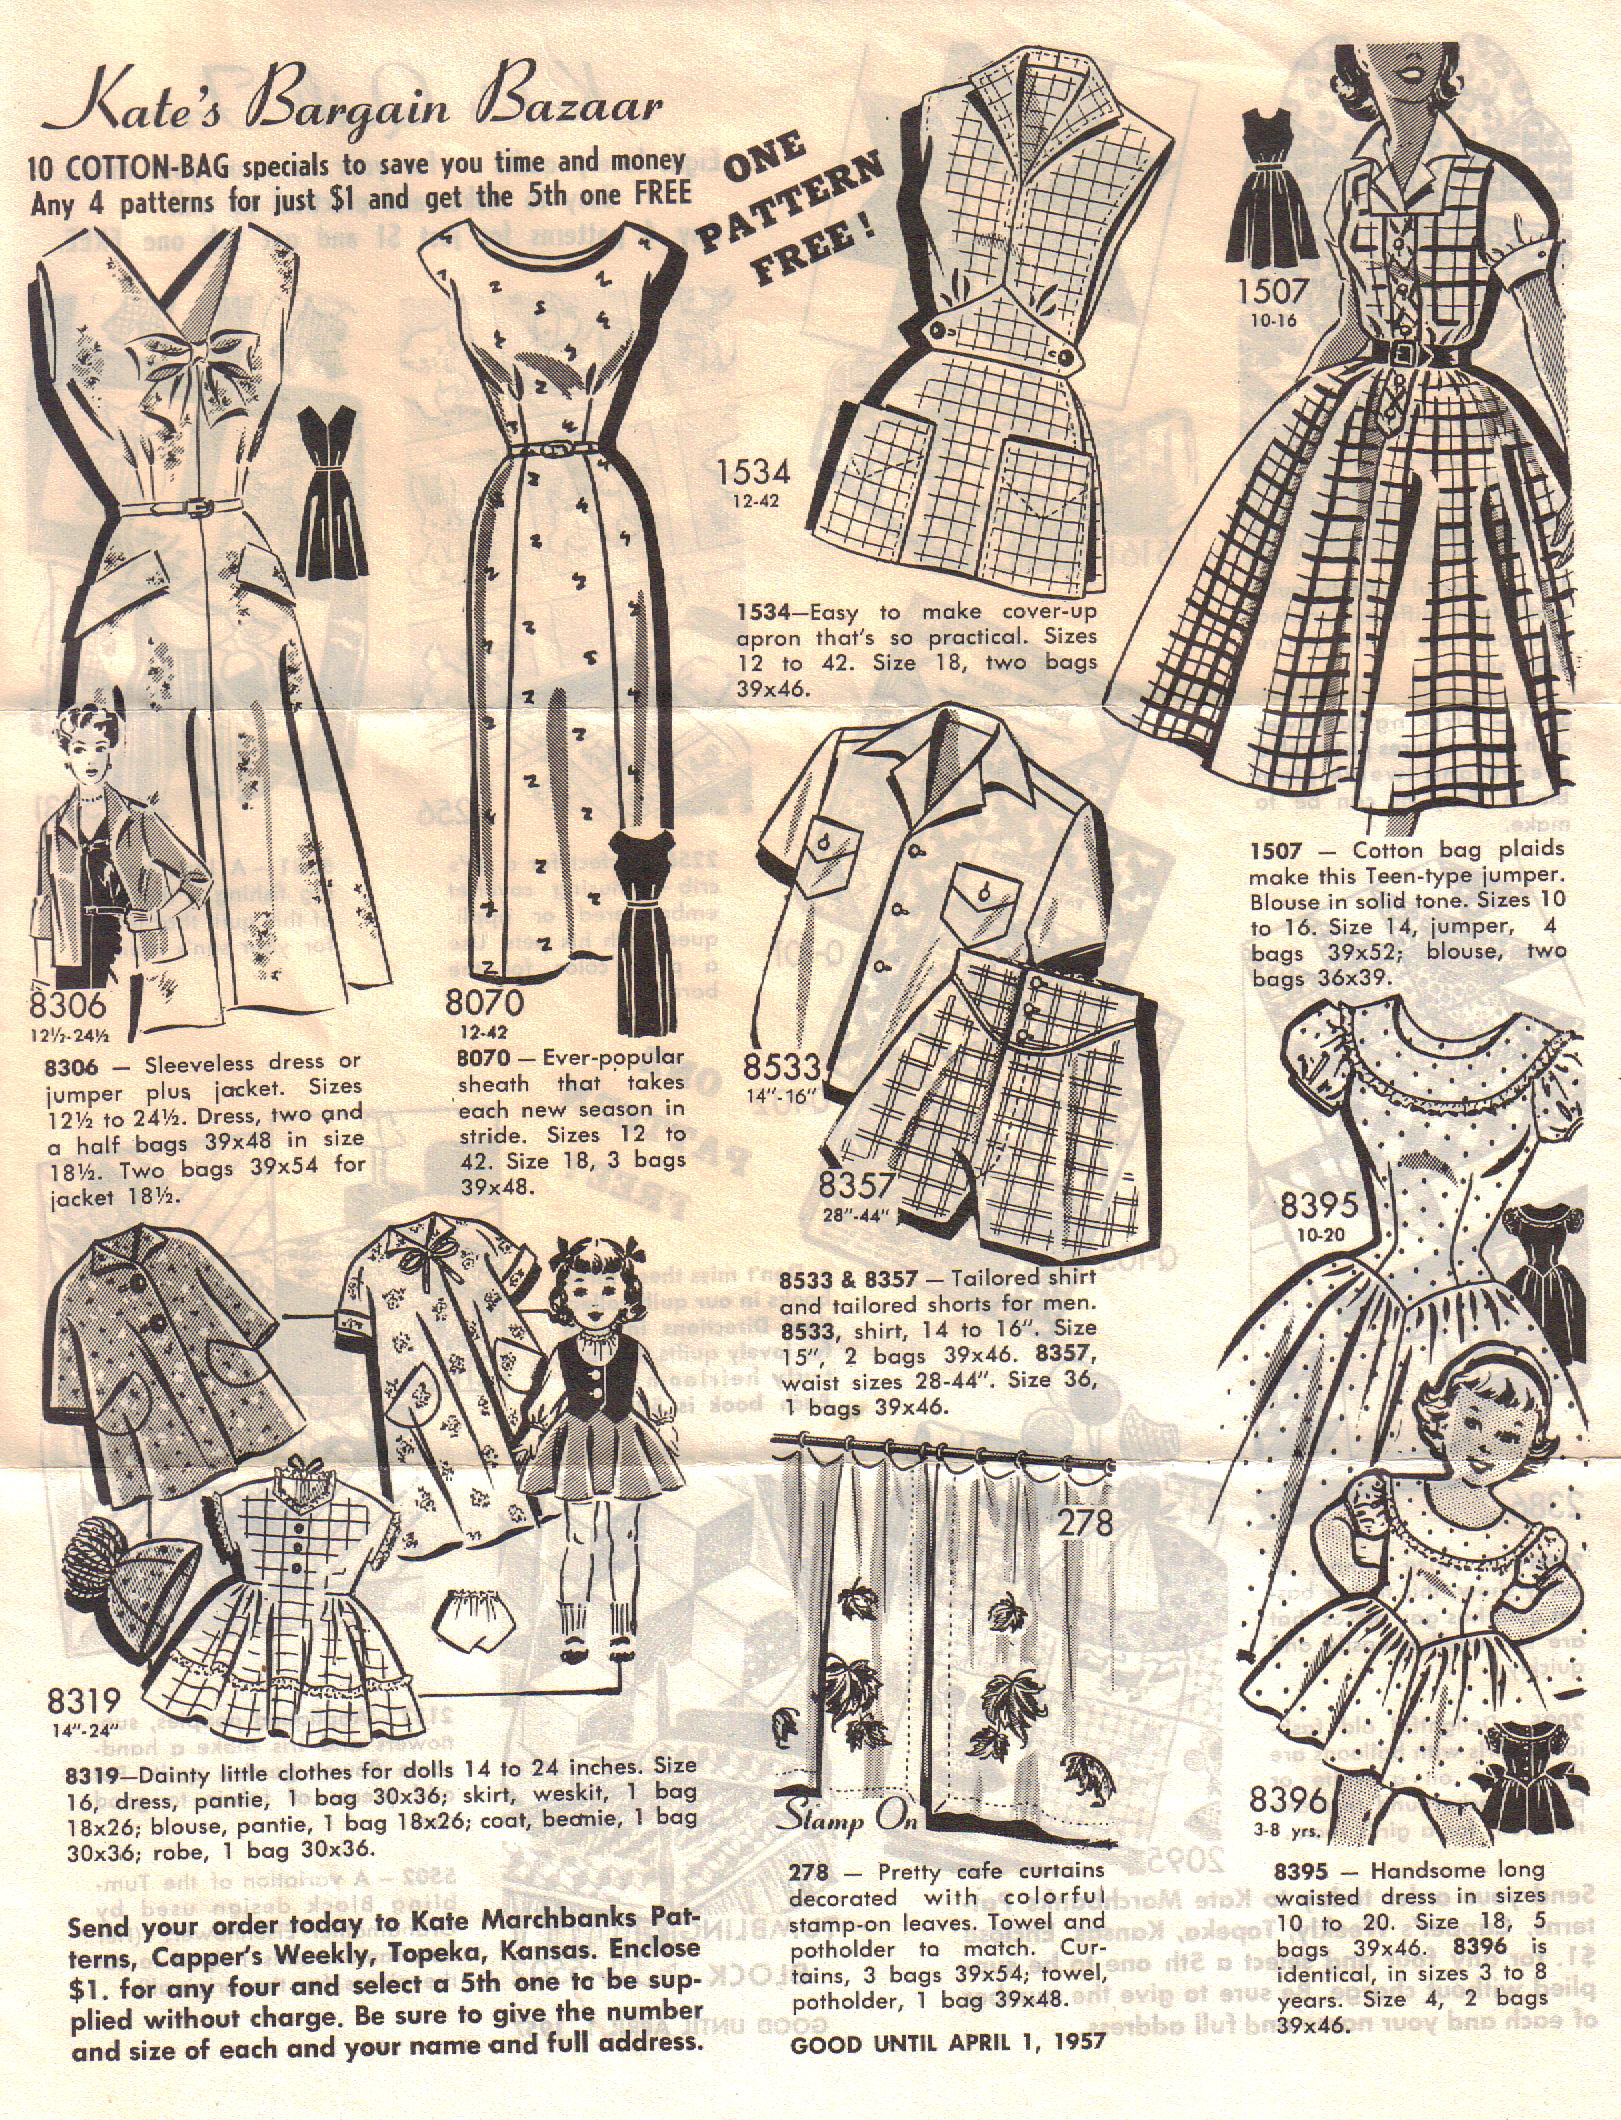 Kate Marchbanks Mail Order Ad 1956